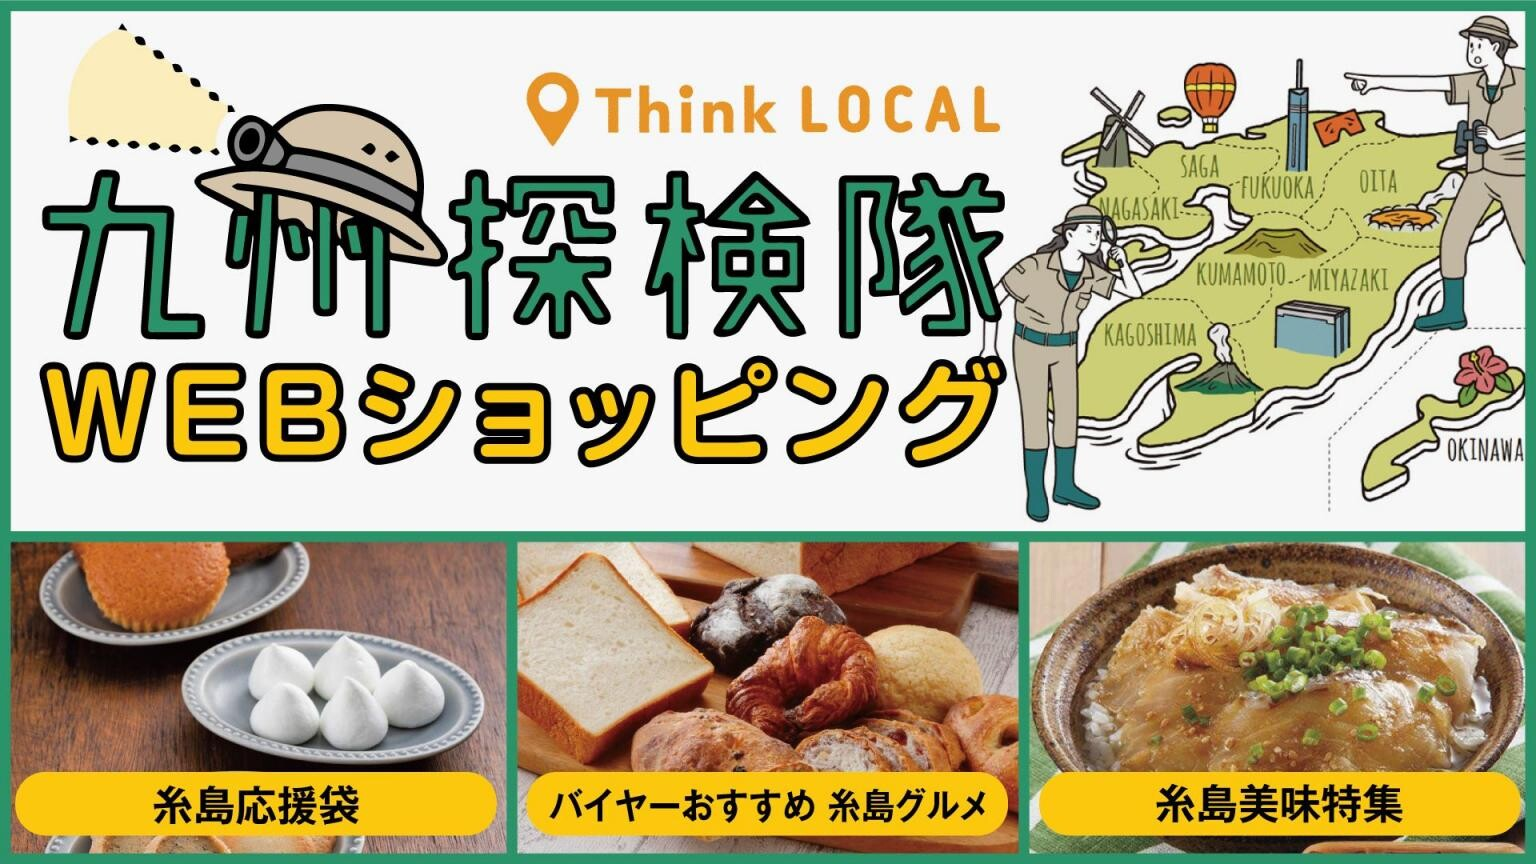 THINK LOCAL 九州探検隊 糸島グルメ特集